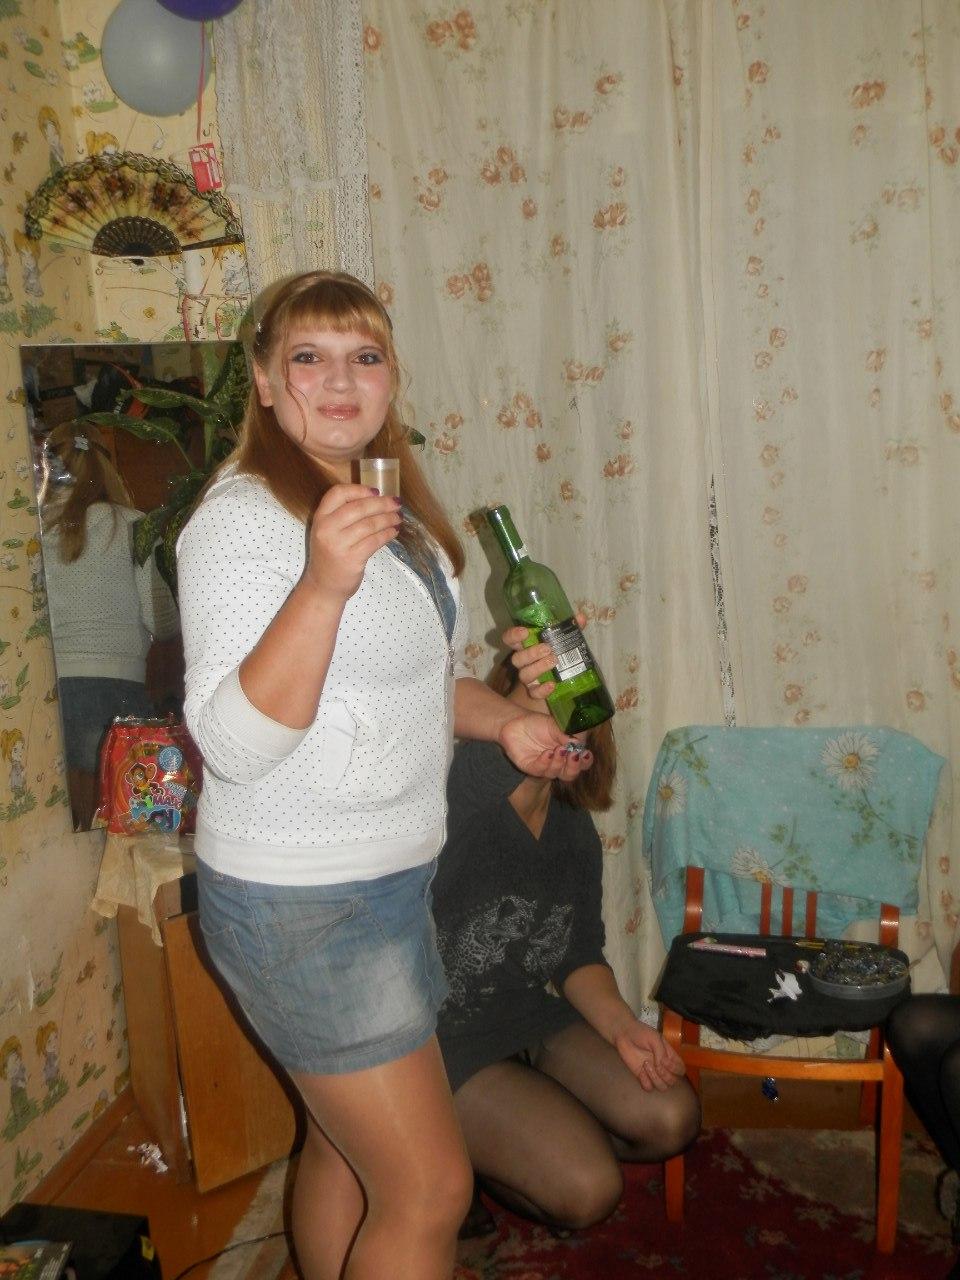 Девушки Без Трусов Порно Фото Вконтакте